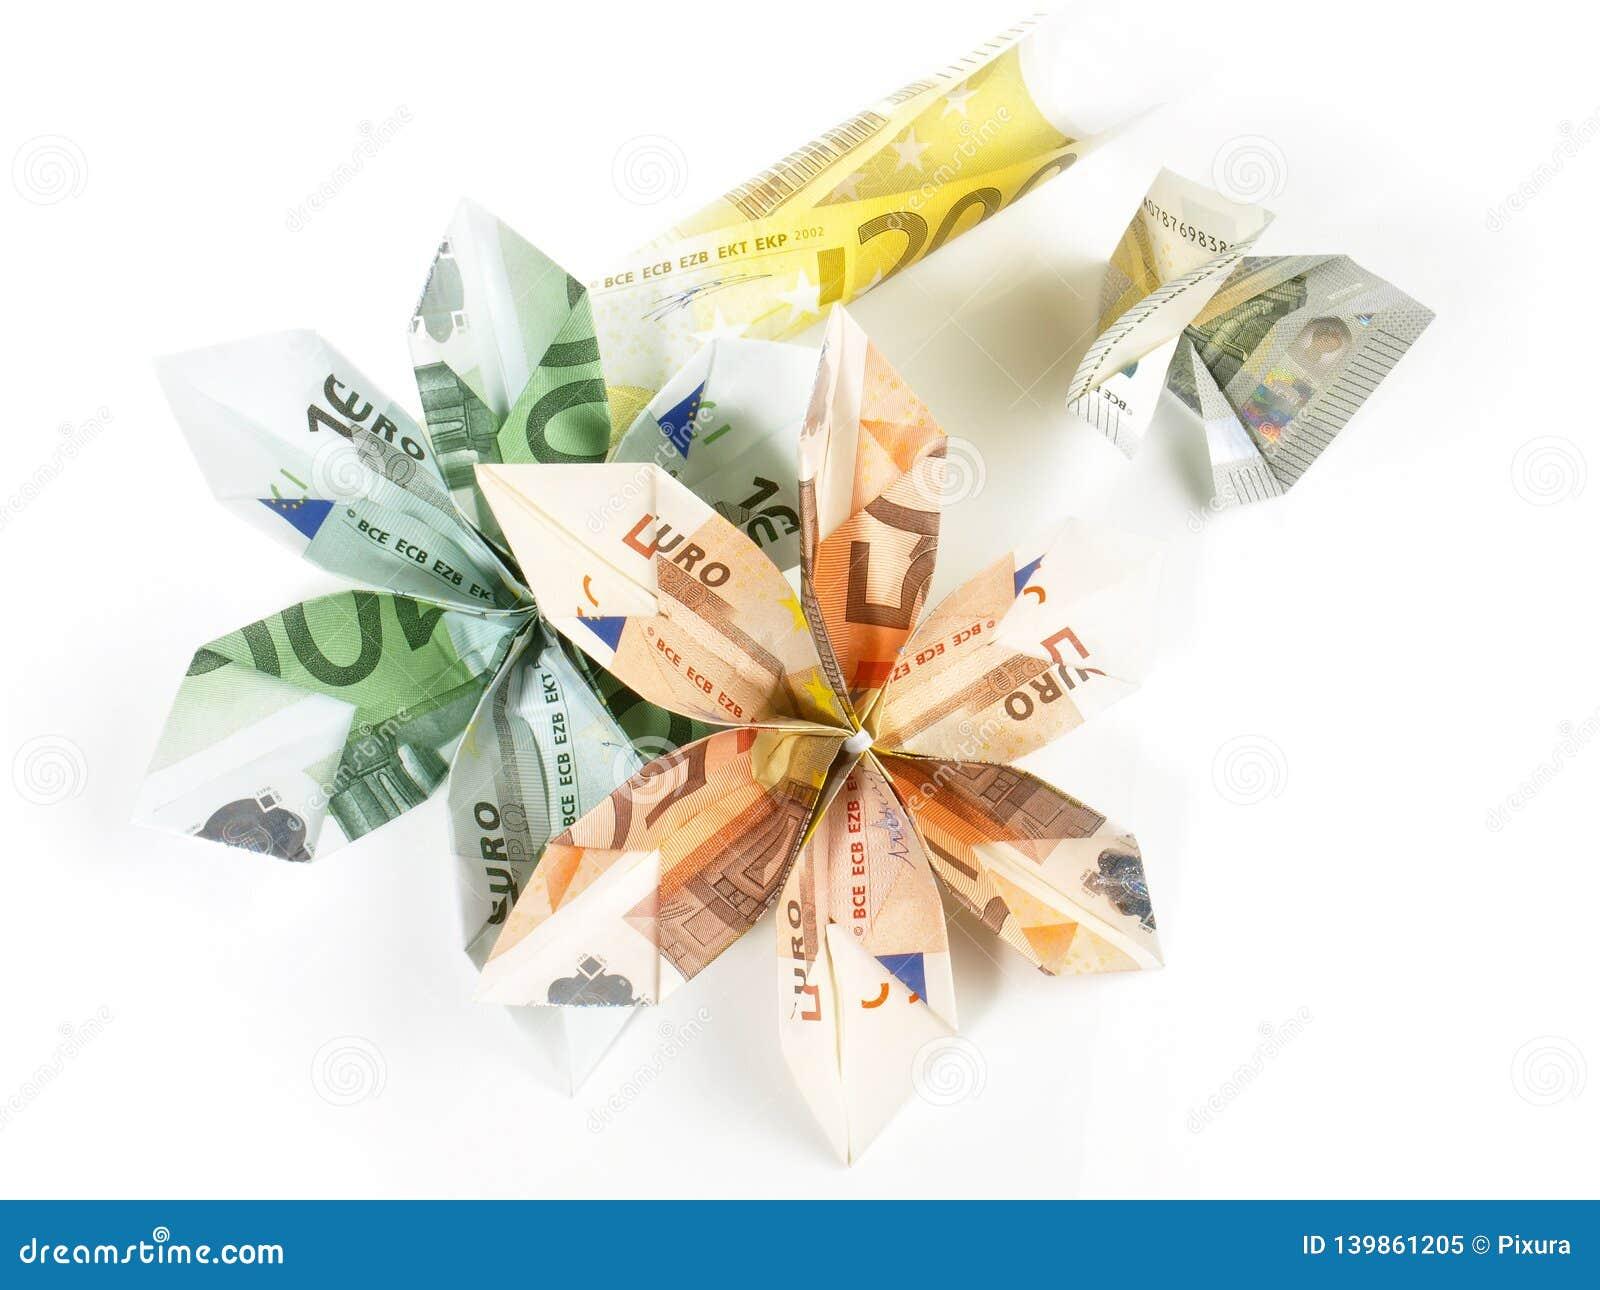 25 Money Origami Tutorials | 3D Dollar Bill Crafts | 1289x1600